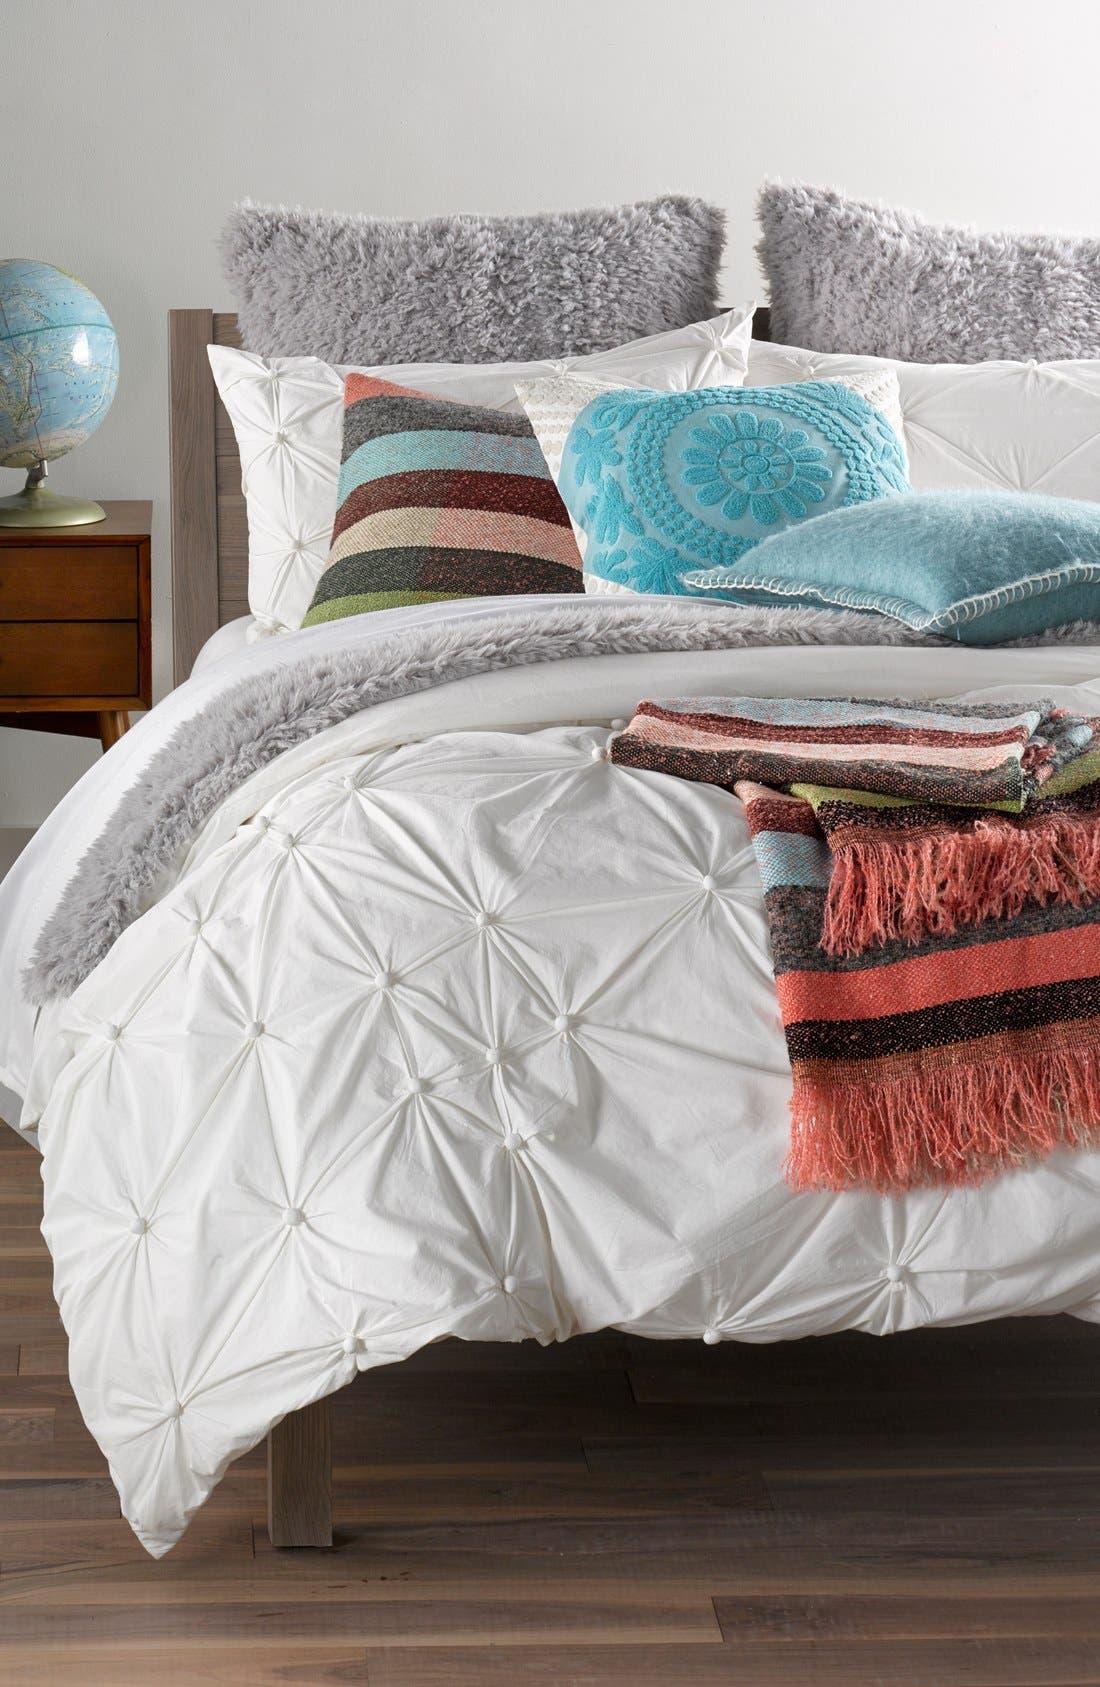 'Shaggy Plush' Faux Fur Blanket,                             Alternate thumbnail 2, color,                             Grey Vapor